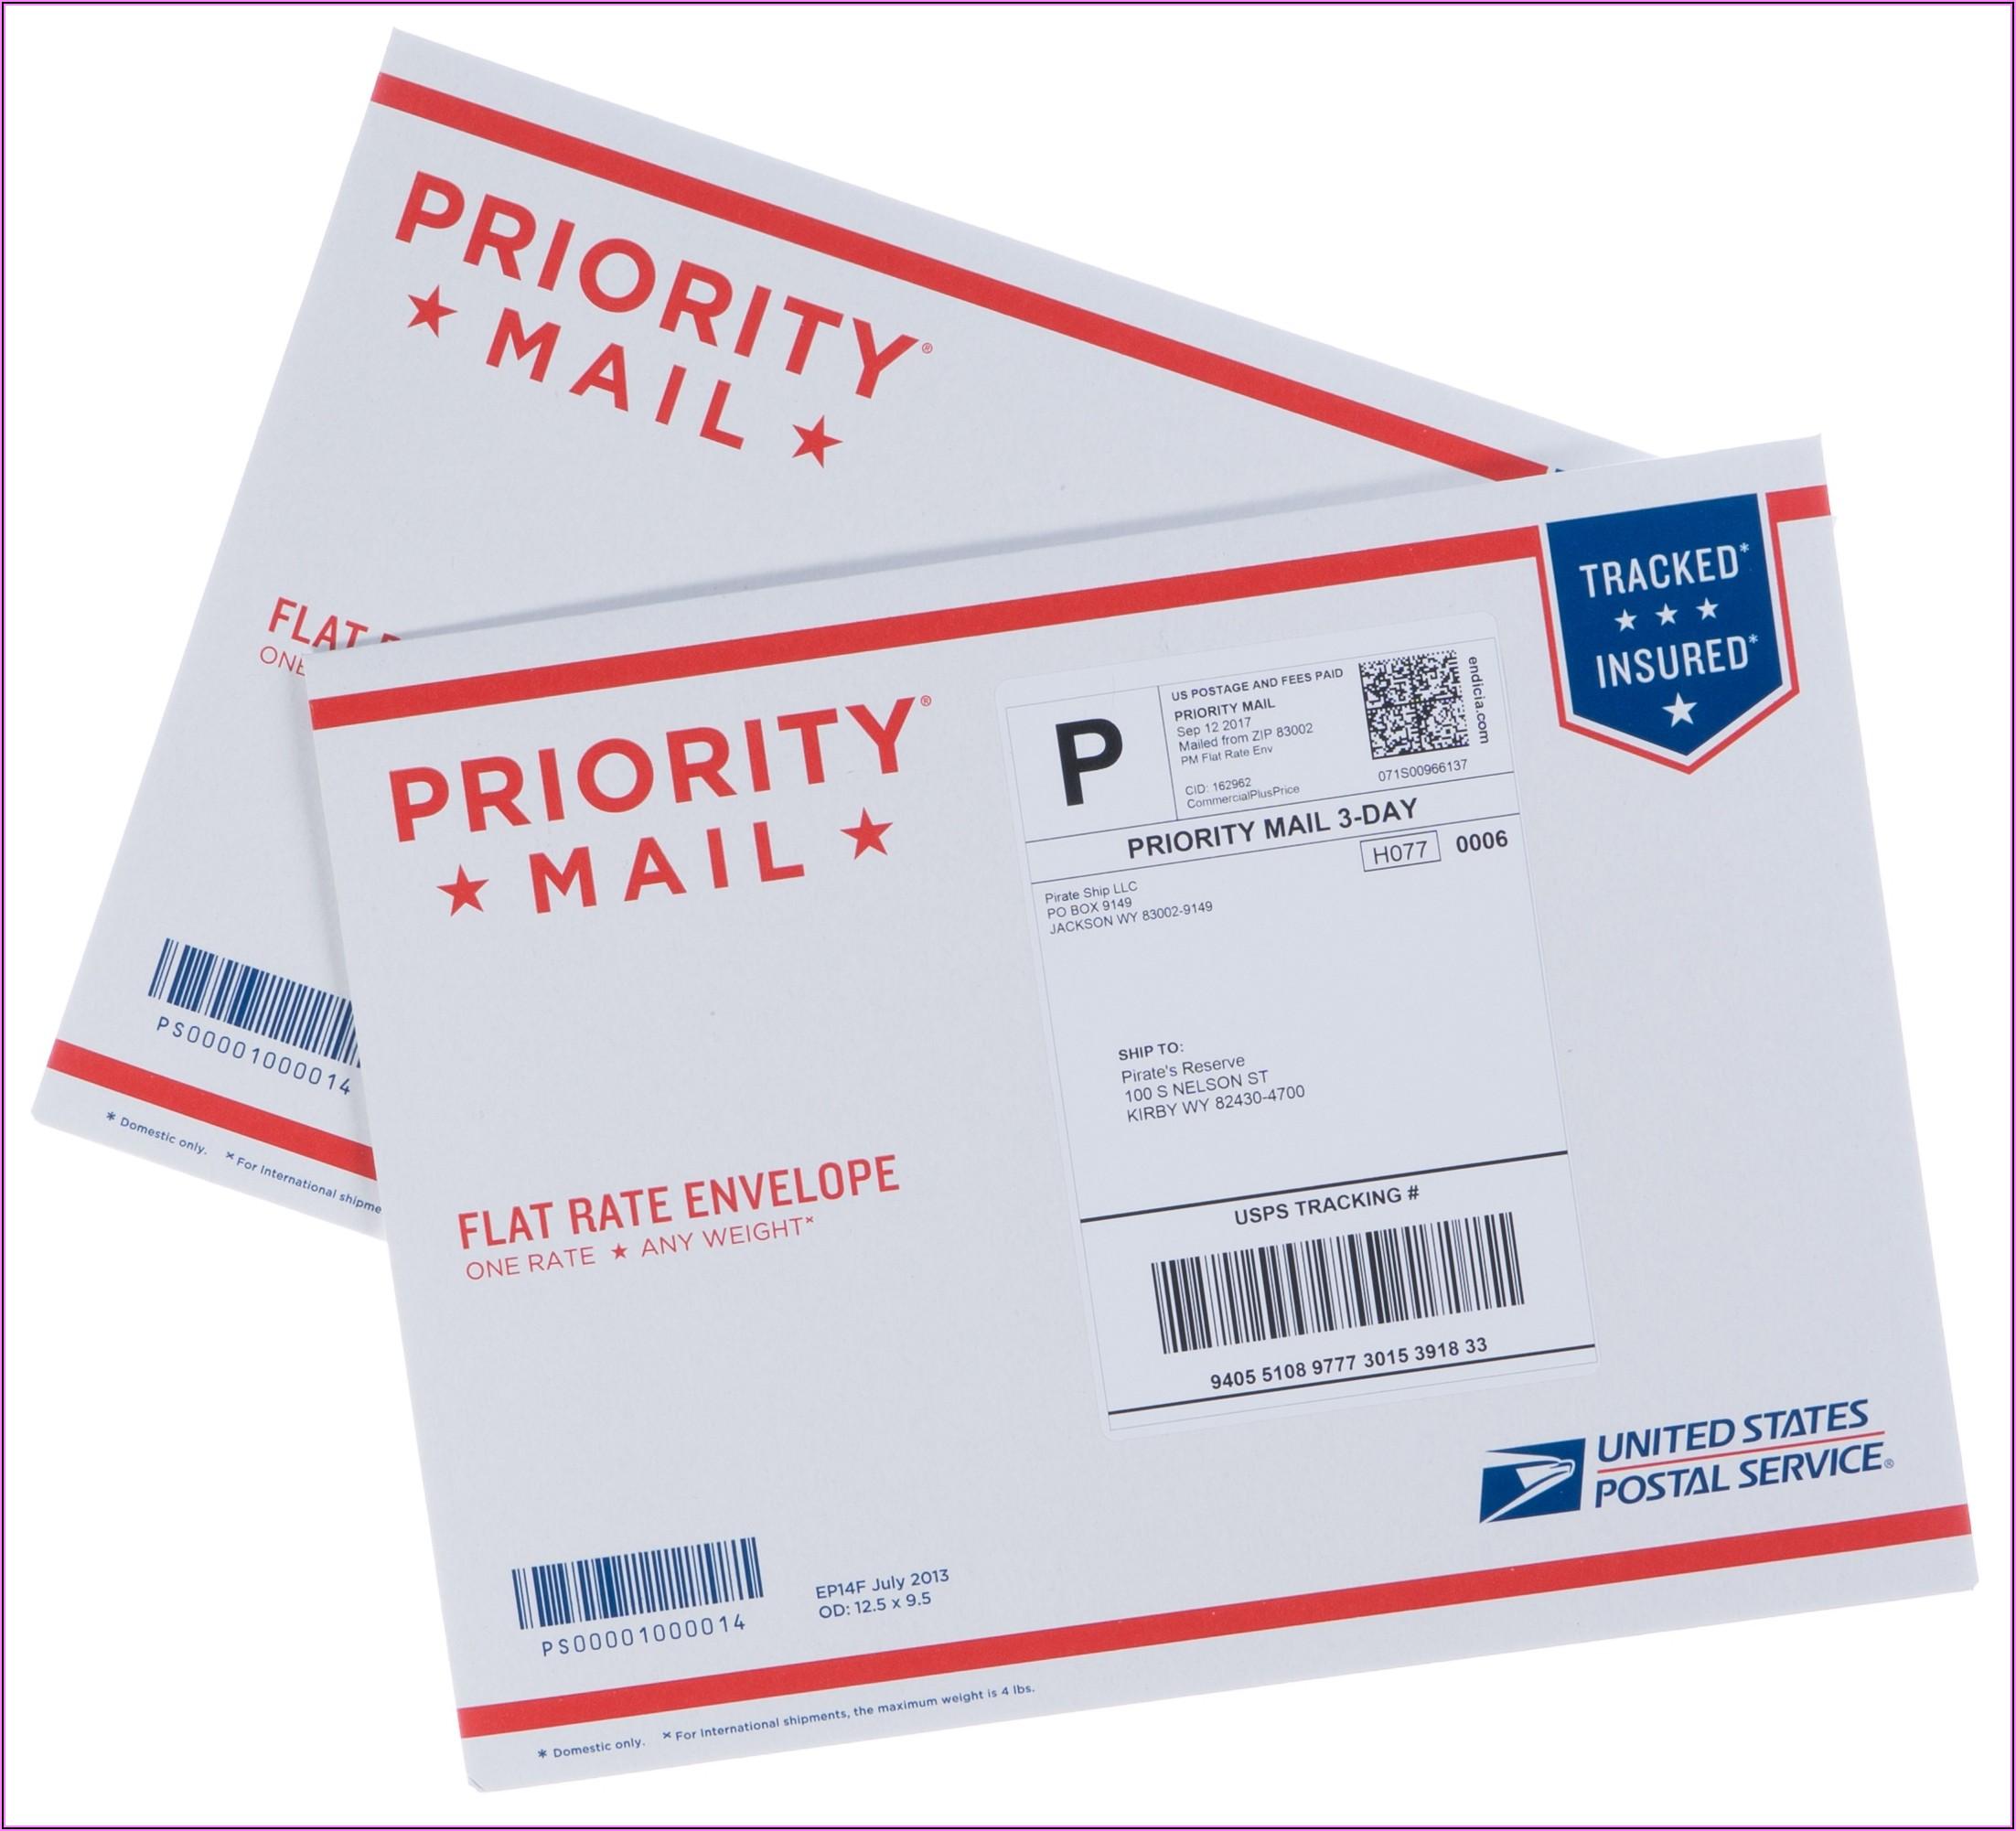 Standard Envelope Sizes Usps